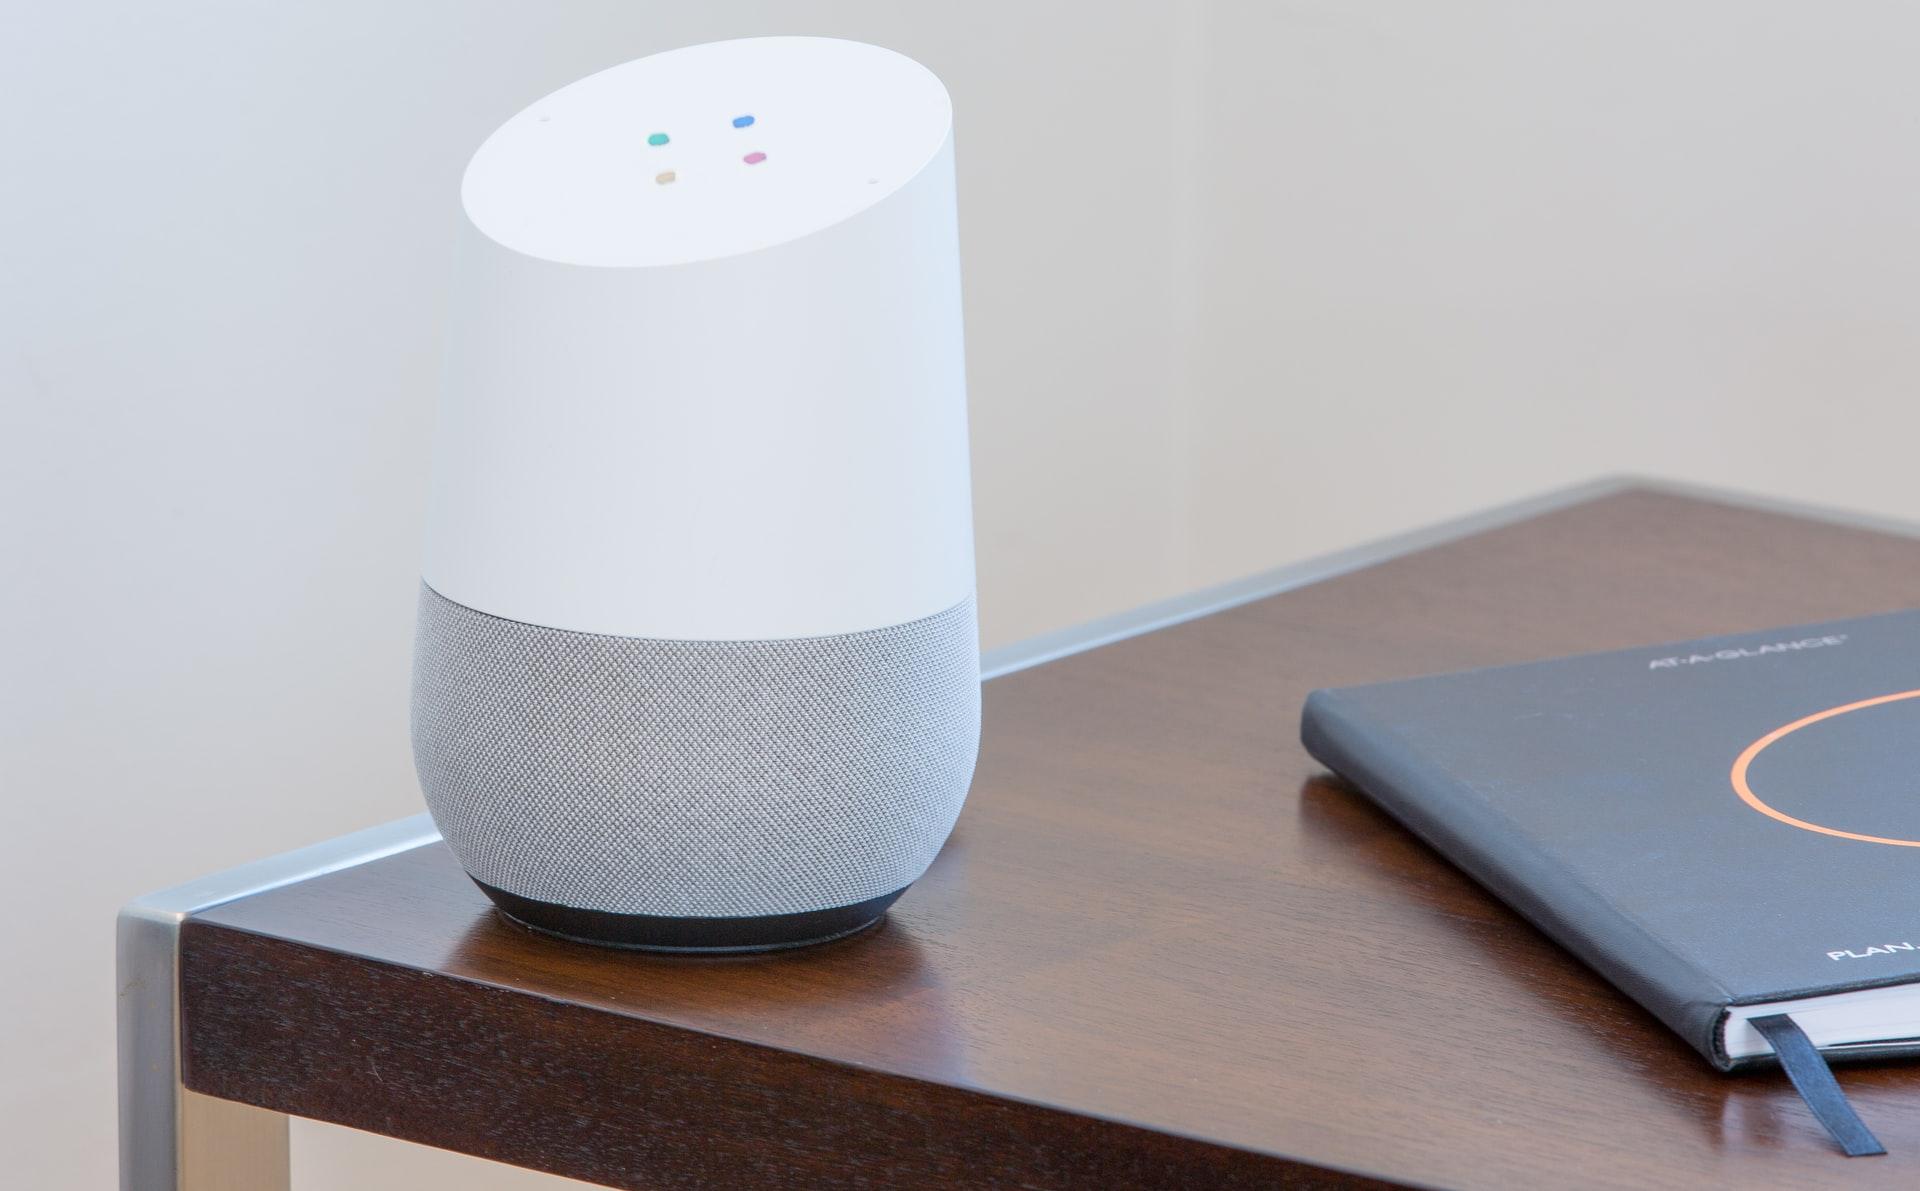 convertir movil viejo en google home